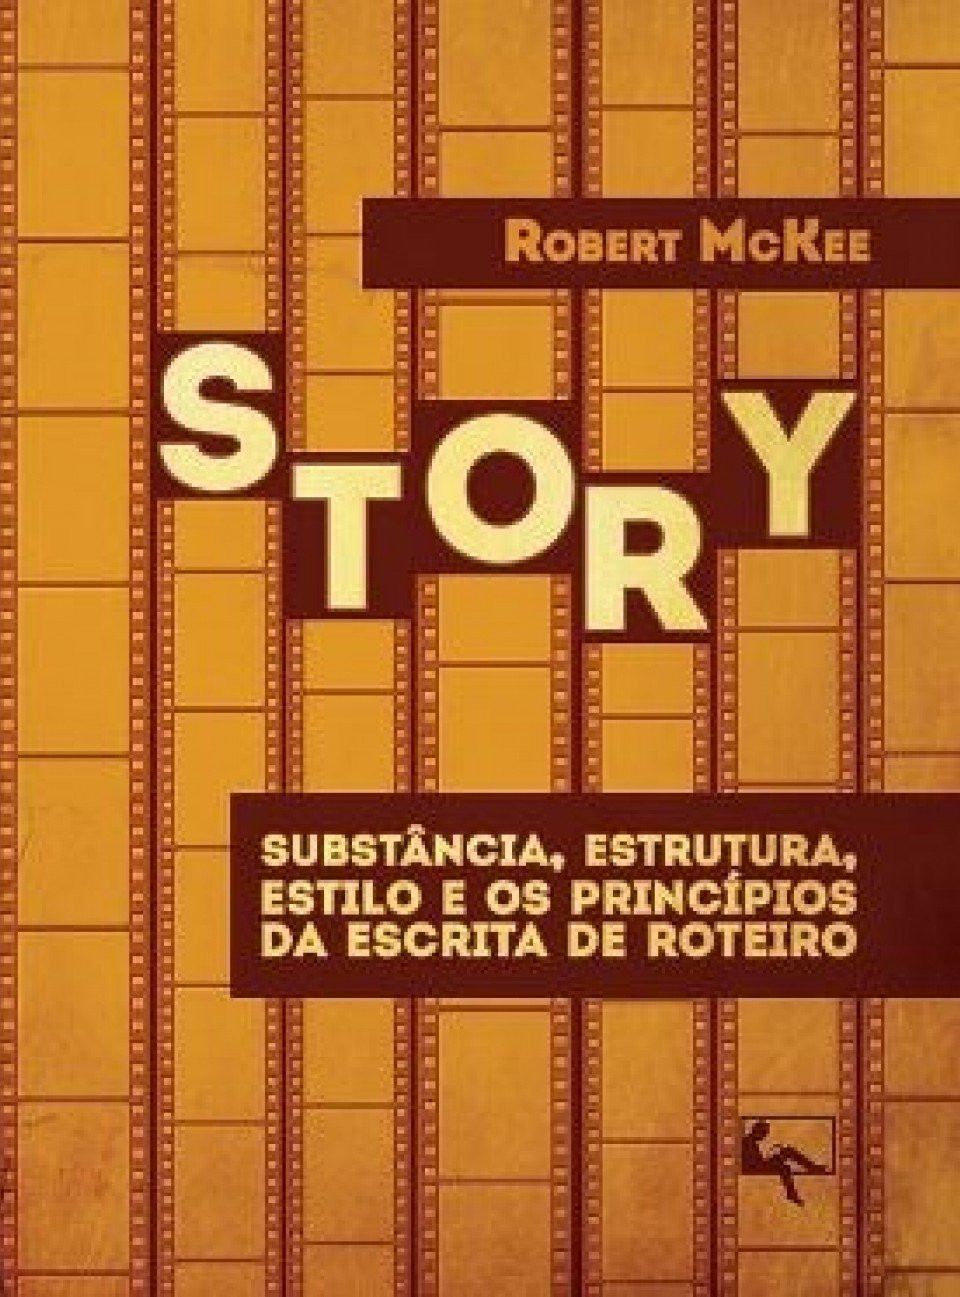 Livro Story Robert McKee